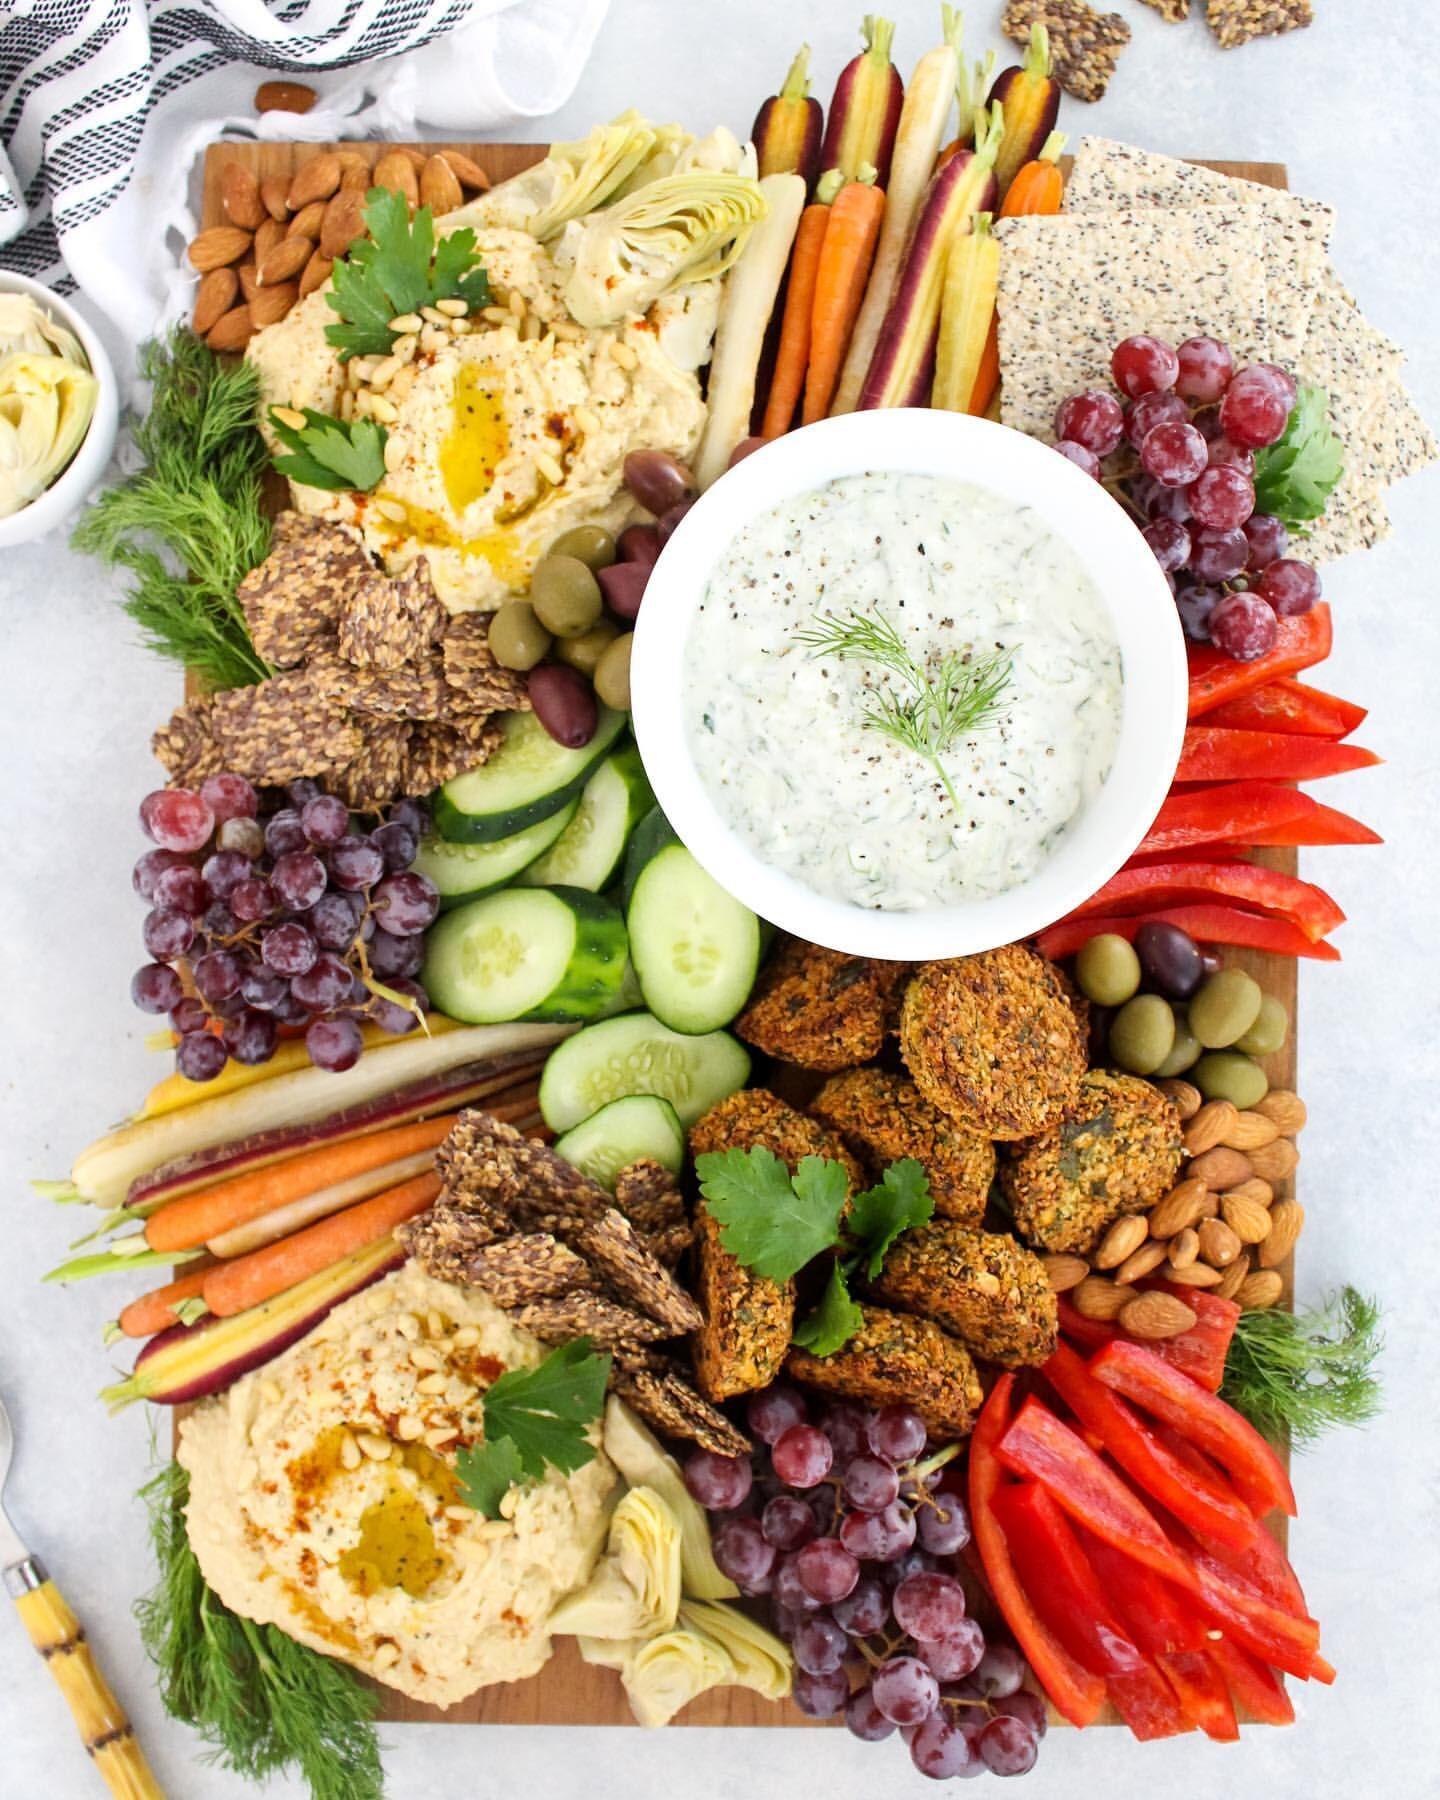 Mediterranean Inspired Mezze Platter By Fitlivingeats Quick Easy Recipe The Feedfeed